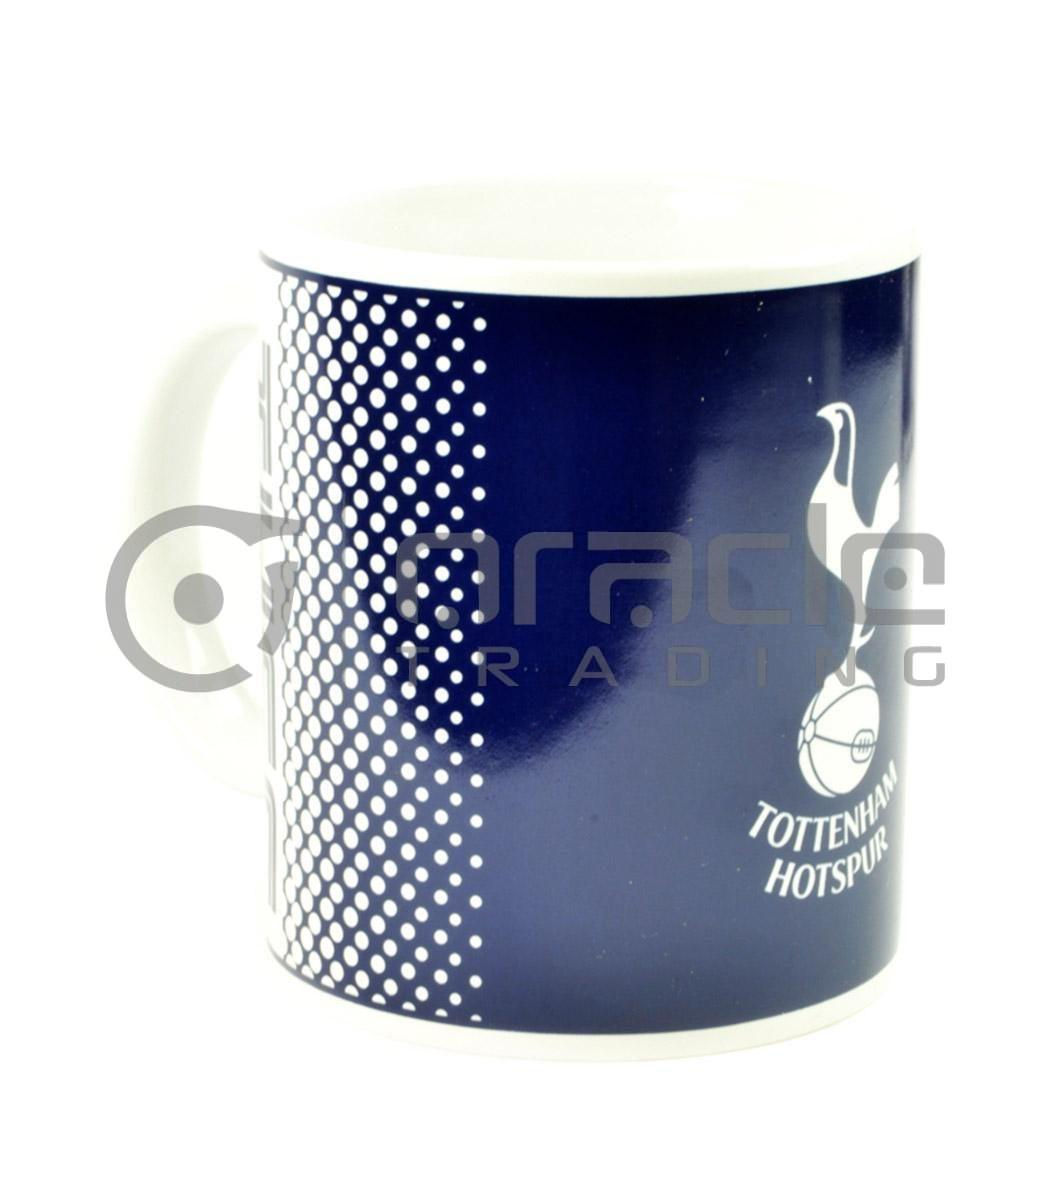 Tottenham Crest Mug (Boxed)